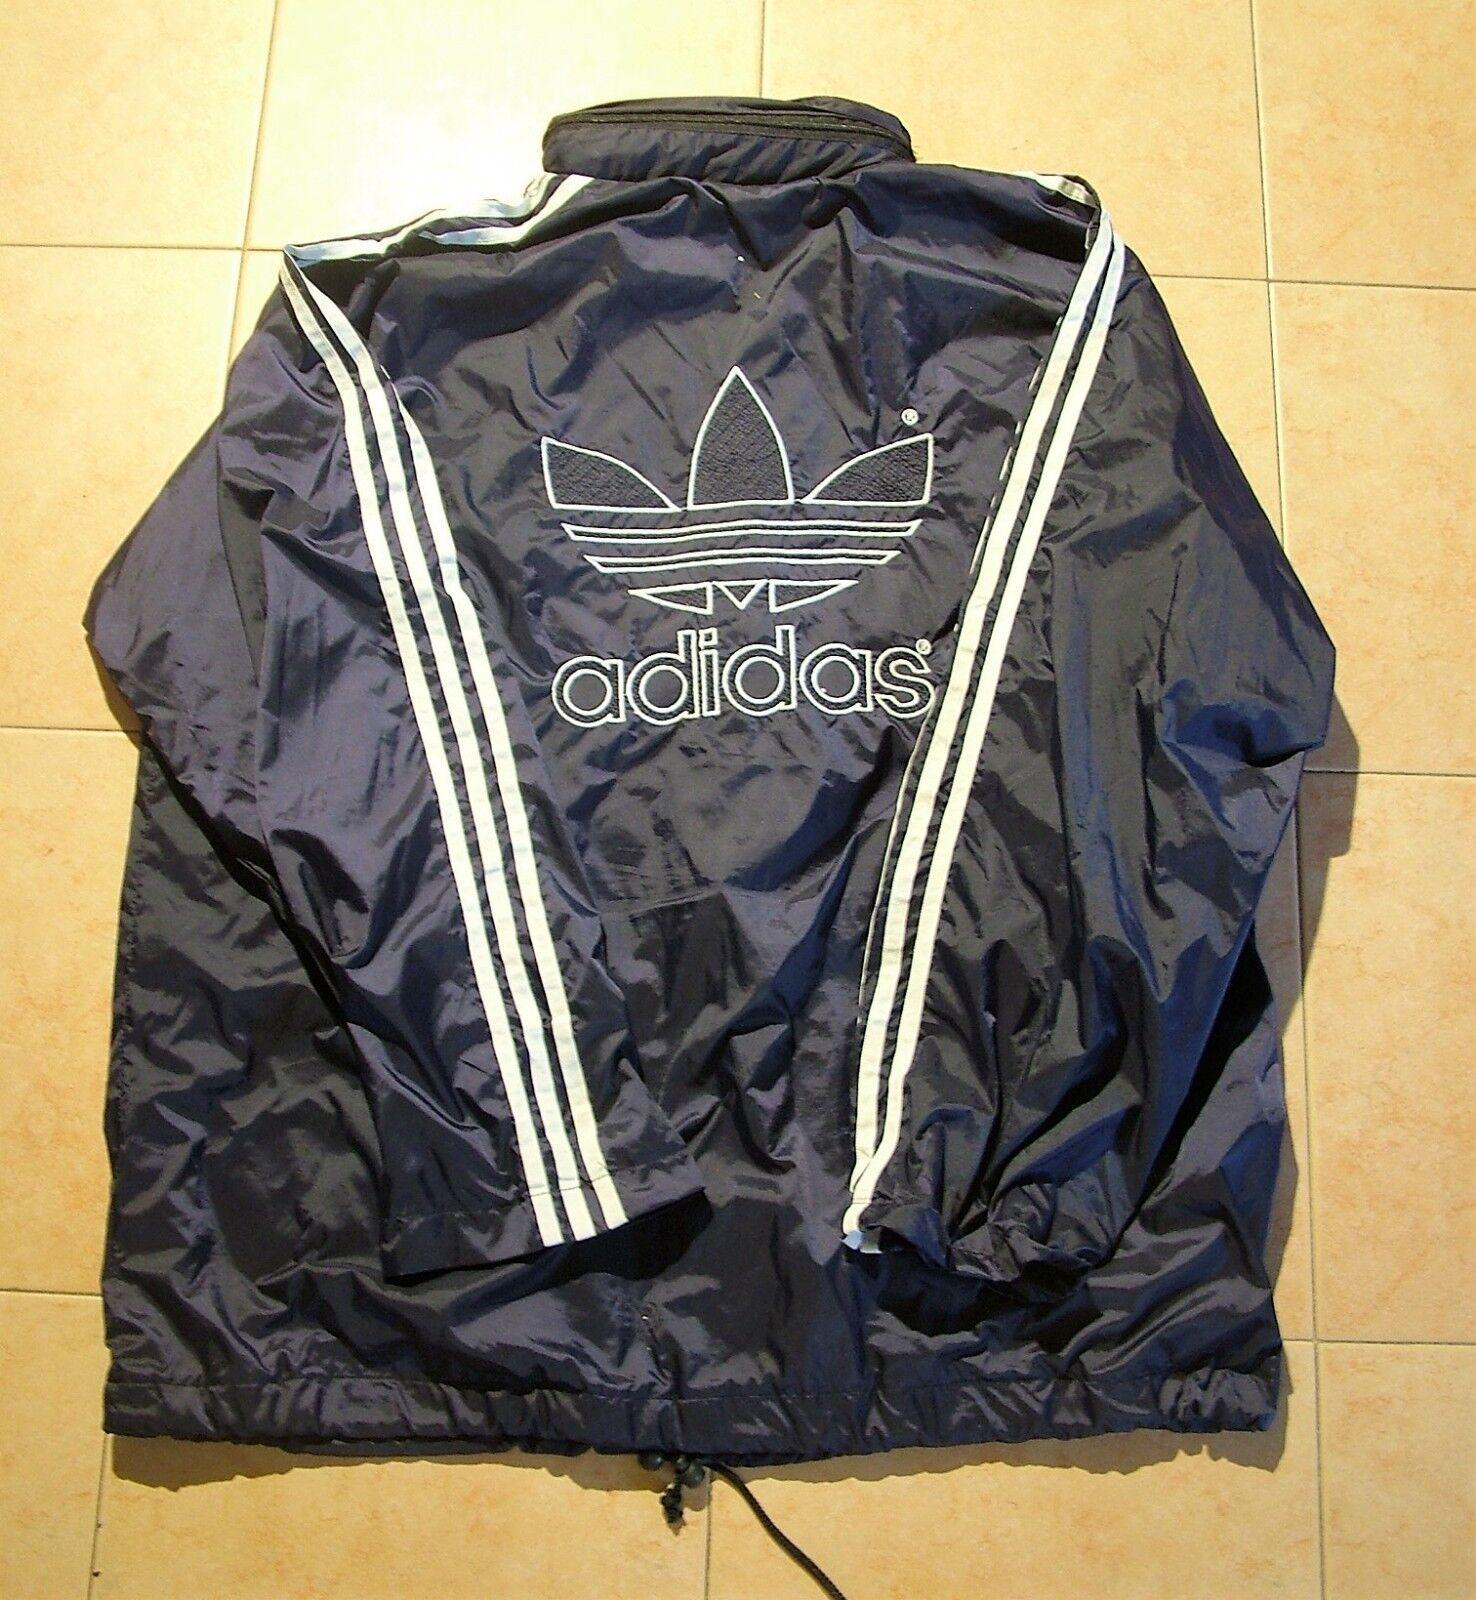 ADIDAS giacca giubbino antipioggia blue trifoglio